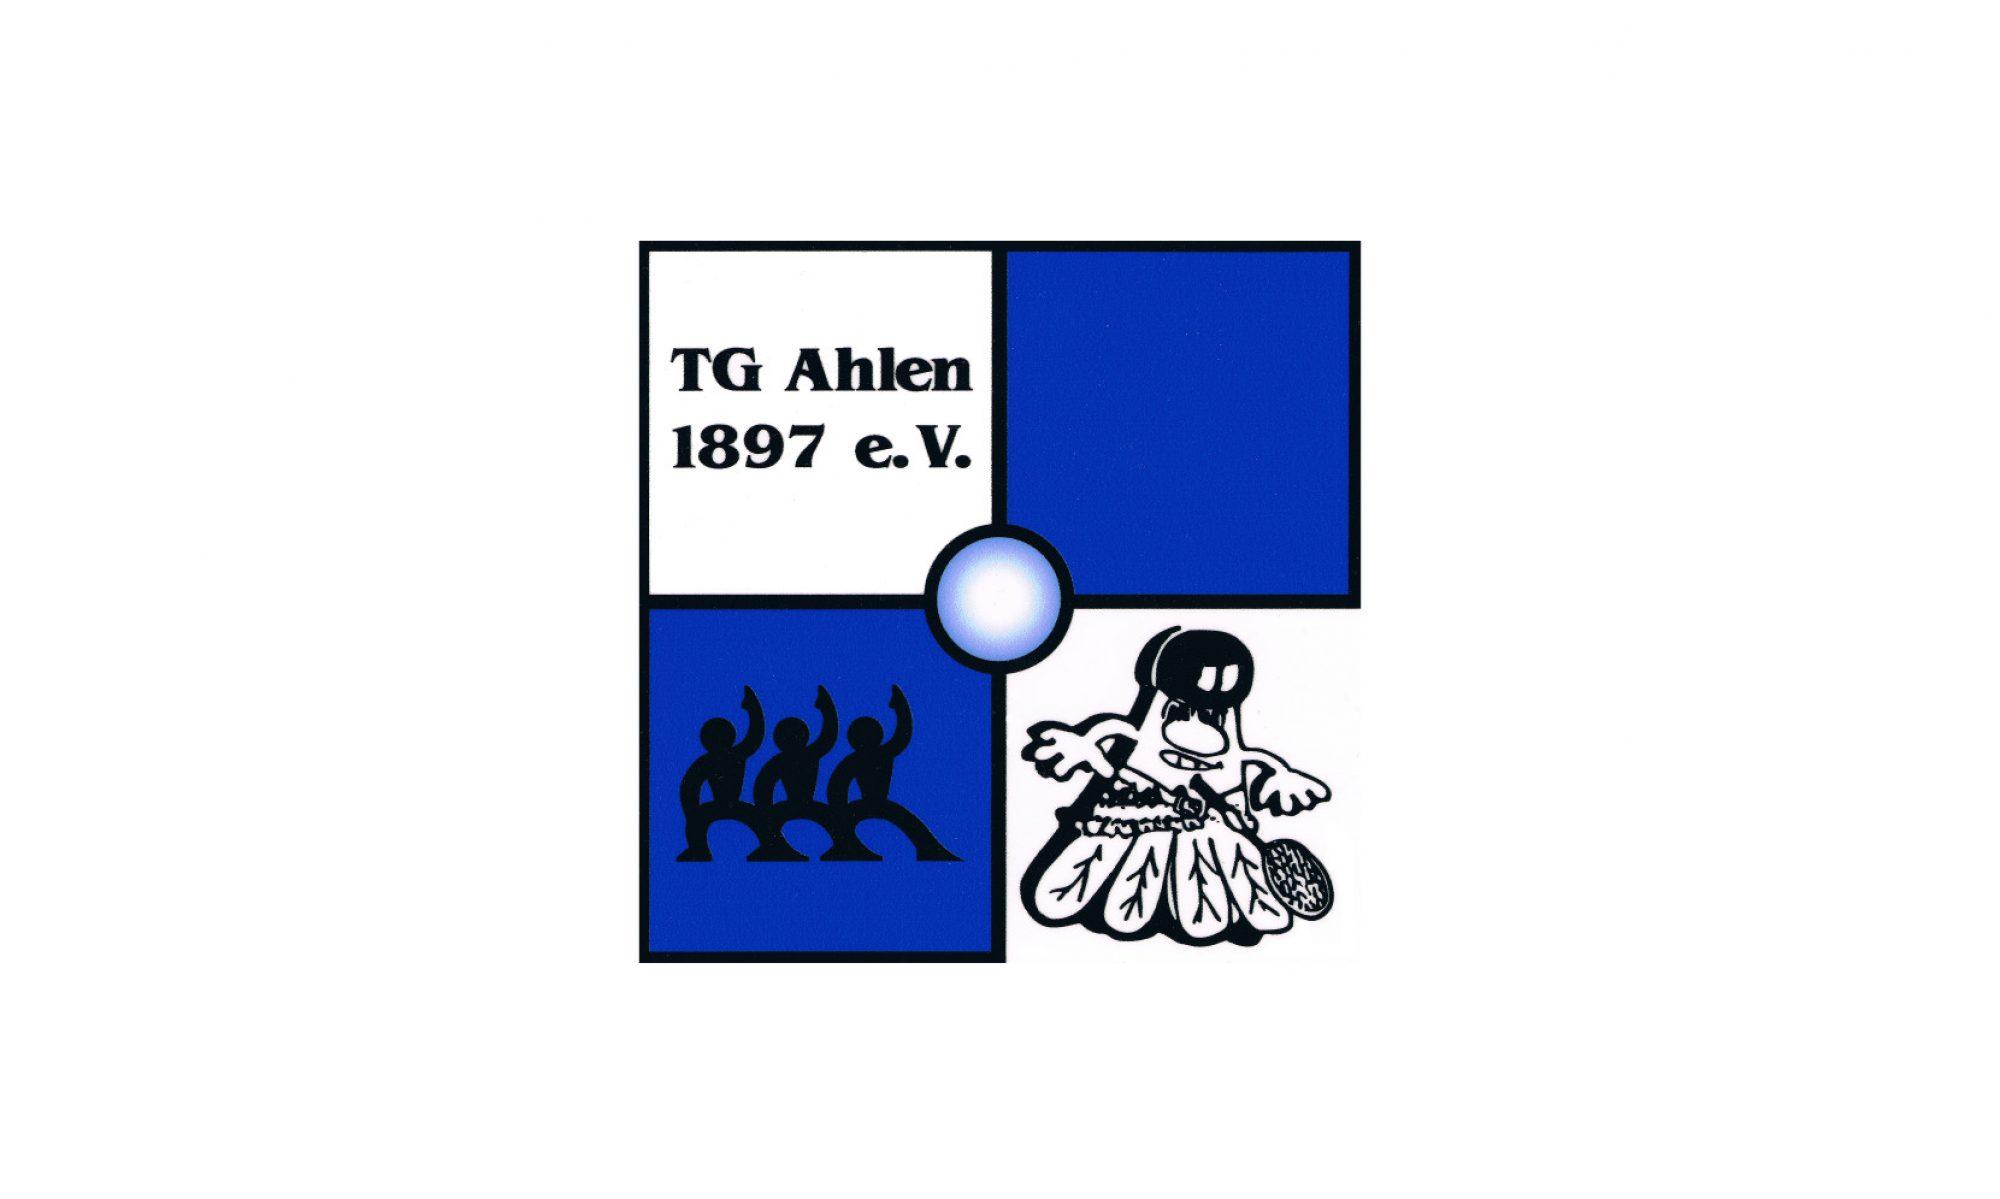 Turngemeinde Ahlen 1897 e.V.